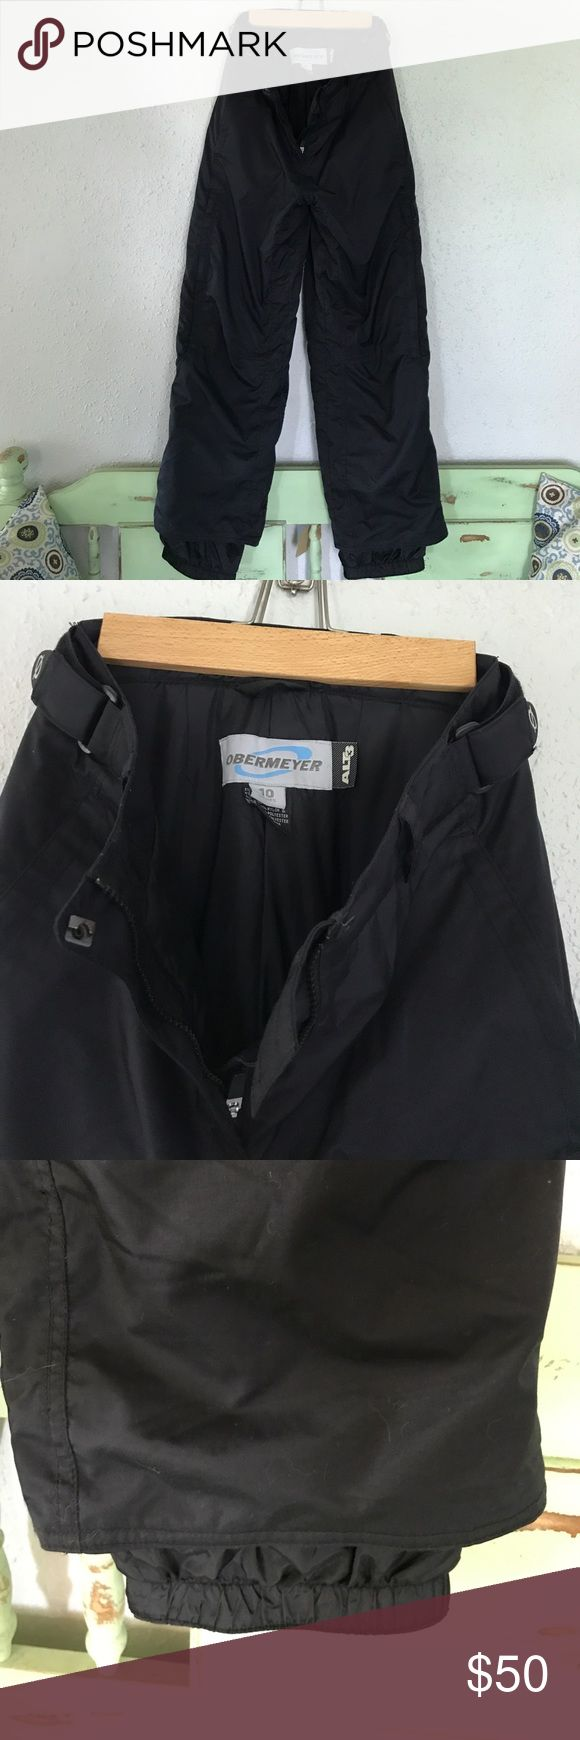 Obermeyer alt3 ski pants Obermeyer black size 10 women's ski pants. Zipper front pockets and Velcro back pockets. Zippers on sides of ski pant legs. Great condition. Obermeyer Other